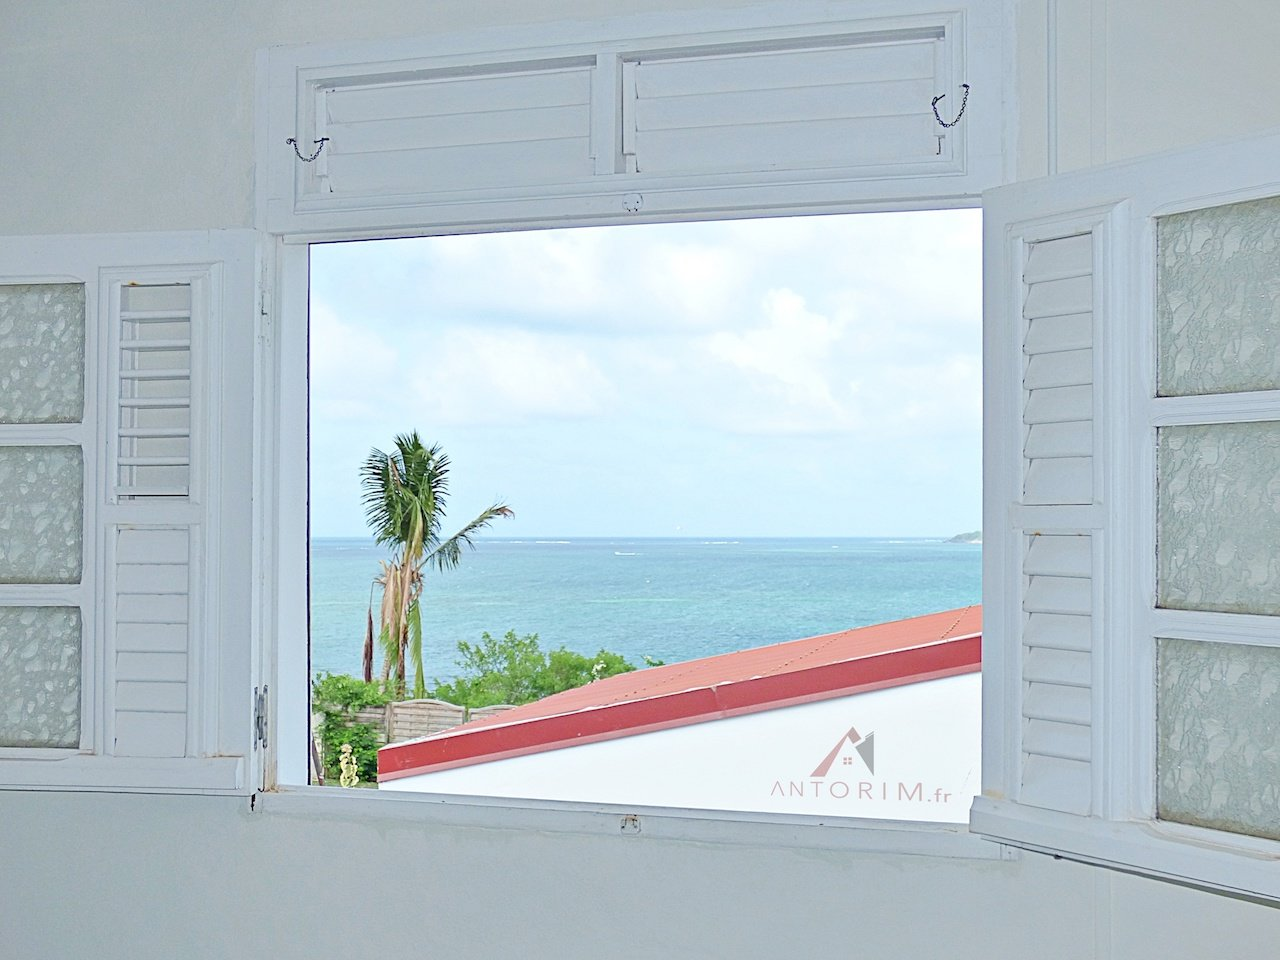 LE FRANCOIS - Grande Villa T6 +T3 - Magnifique Vue Mer